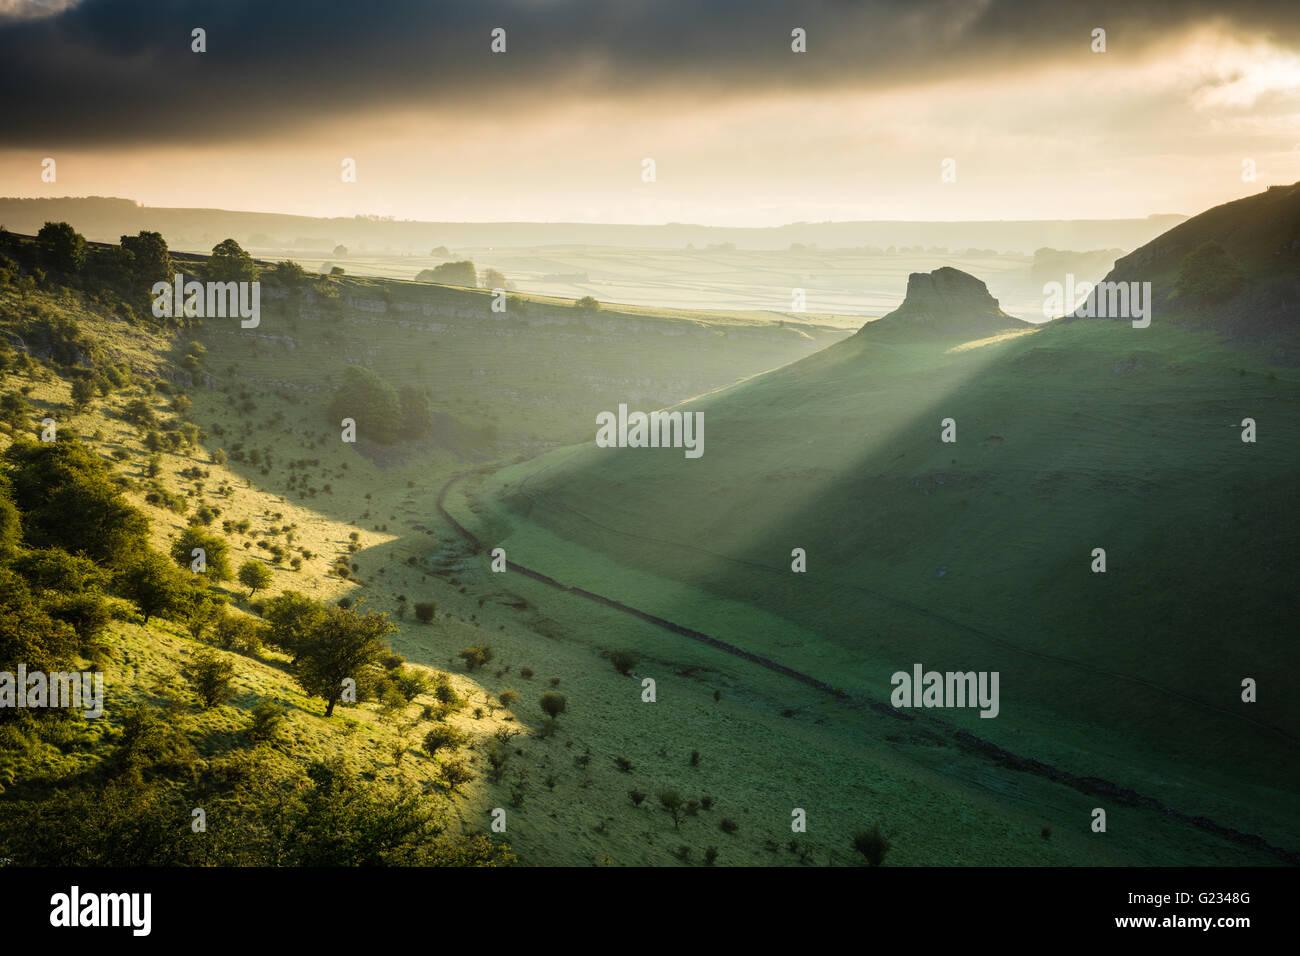 Cressbrook Dale, Peak District National Park. Derbyshire, UK. 23rd May, 2016. UK Weather: First light breaks over Stock Photo